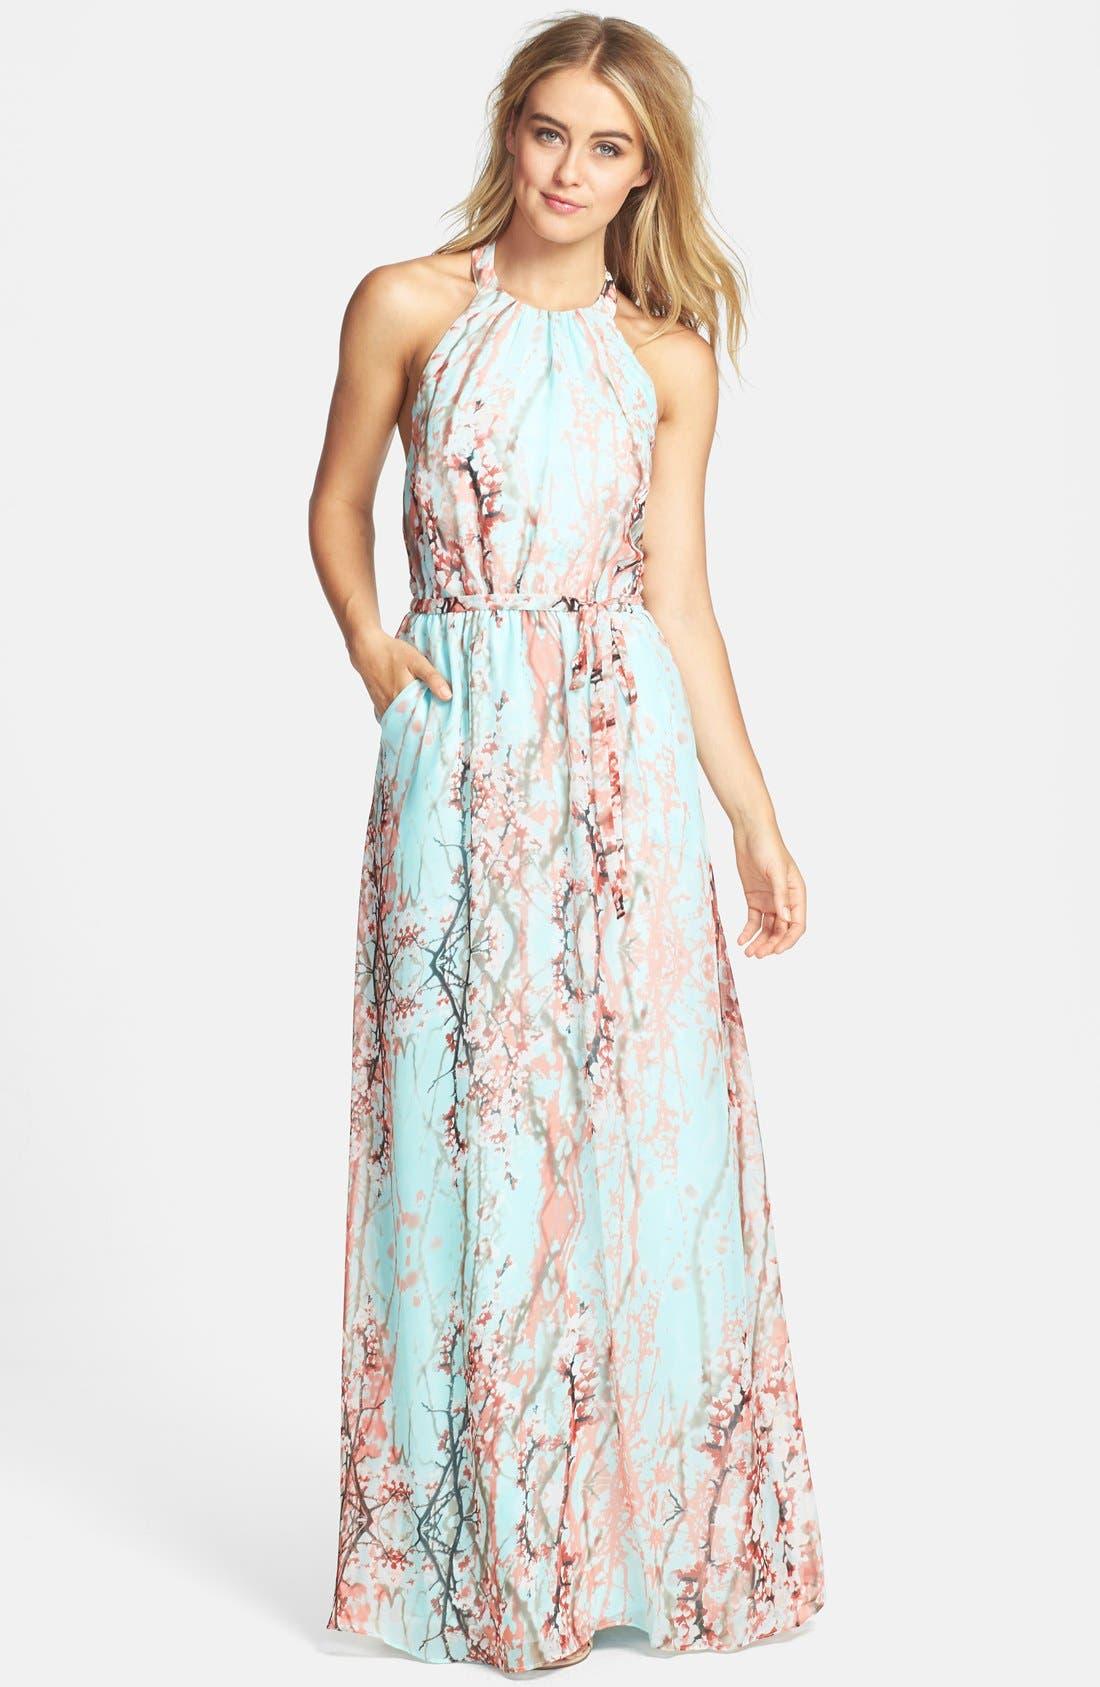 Jessica Simpson Print Chiffon Halter Maxi Dress | Nordstrom